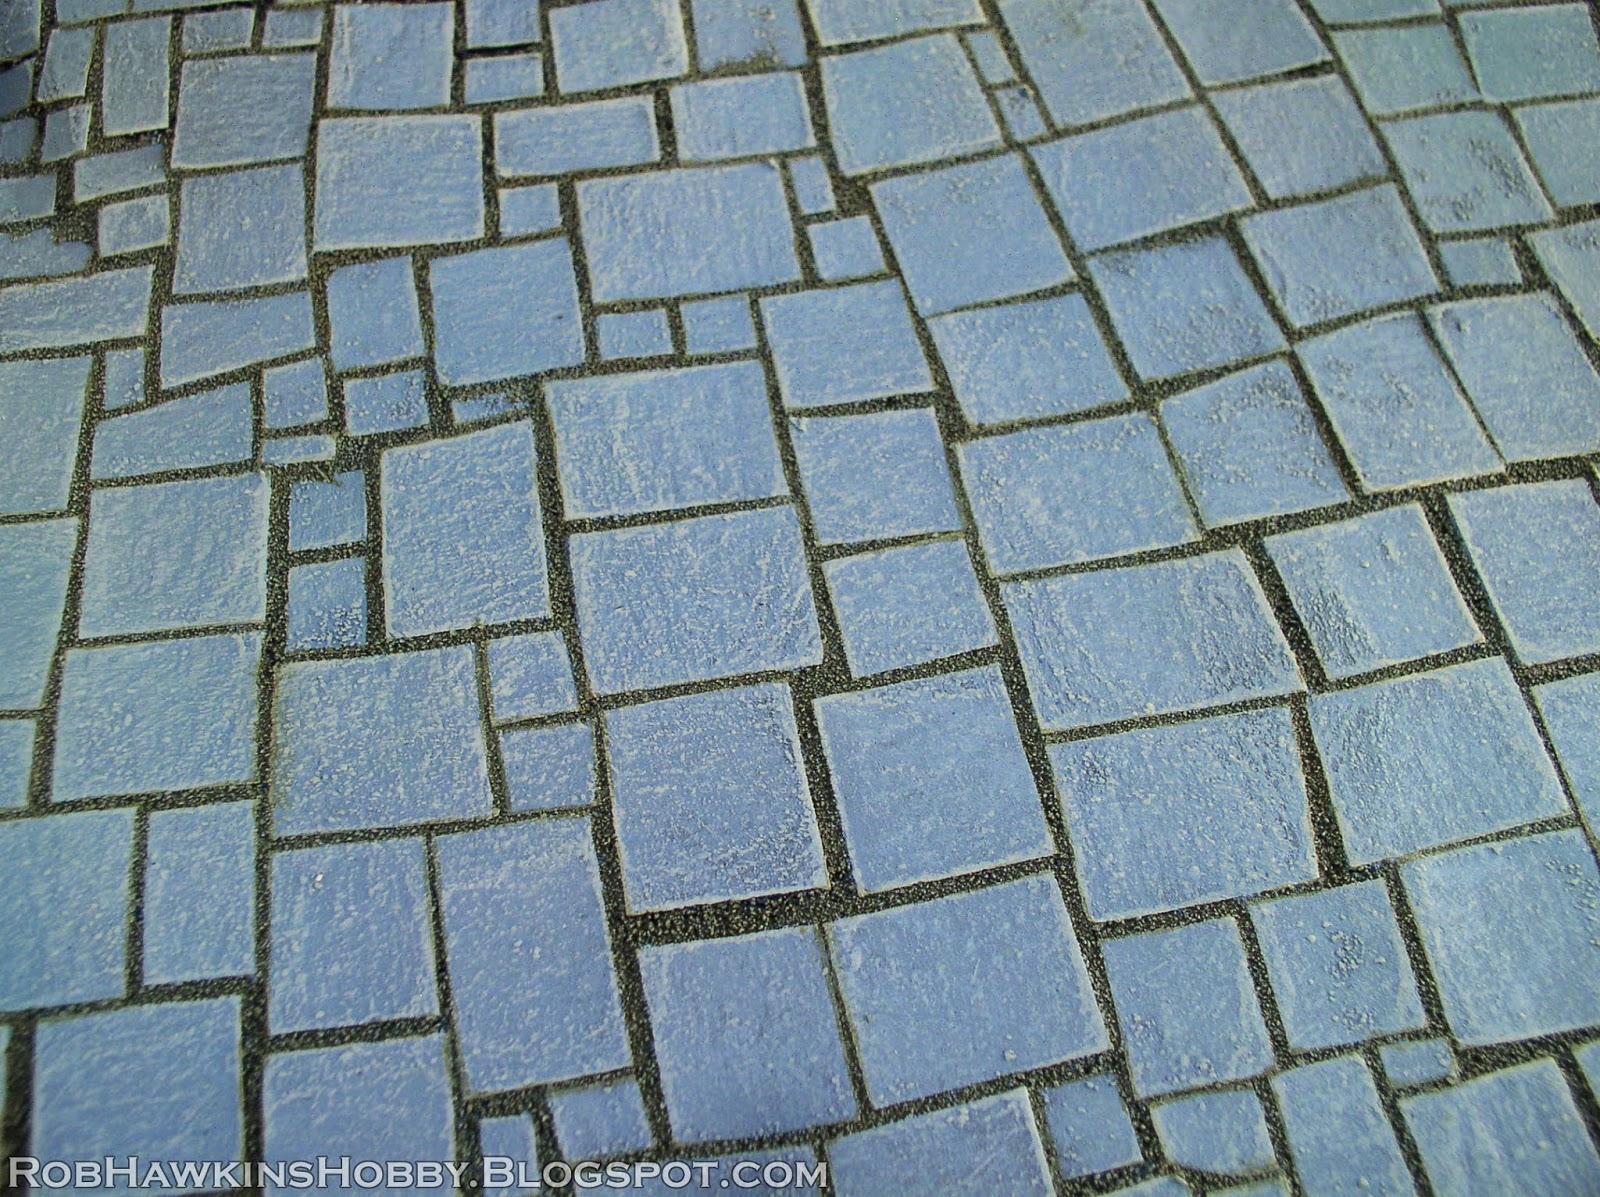 http://robhawkinshobby.blogspot.com/2014/07/terrain-tutorial-flagstone-streets.html